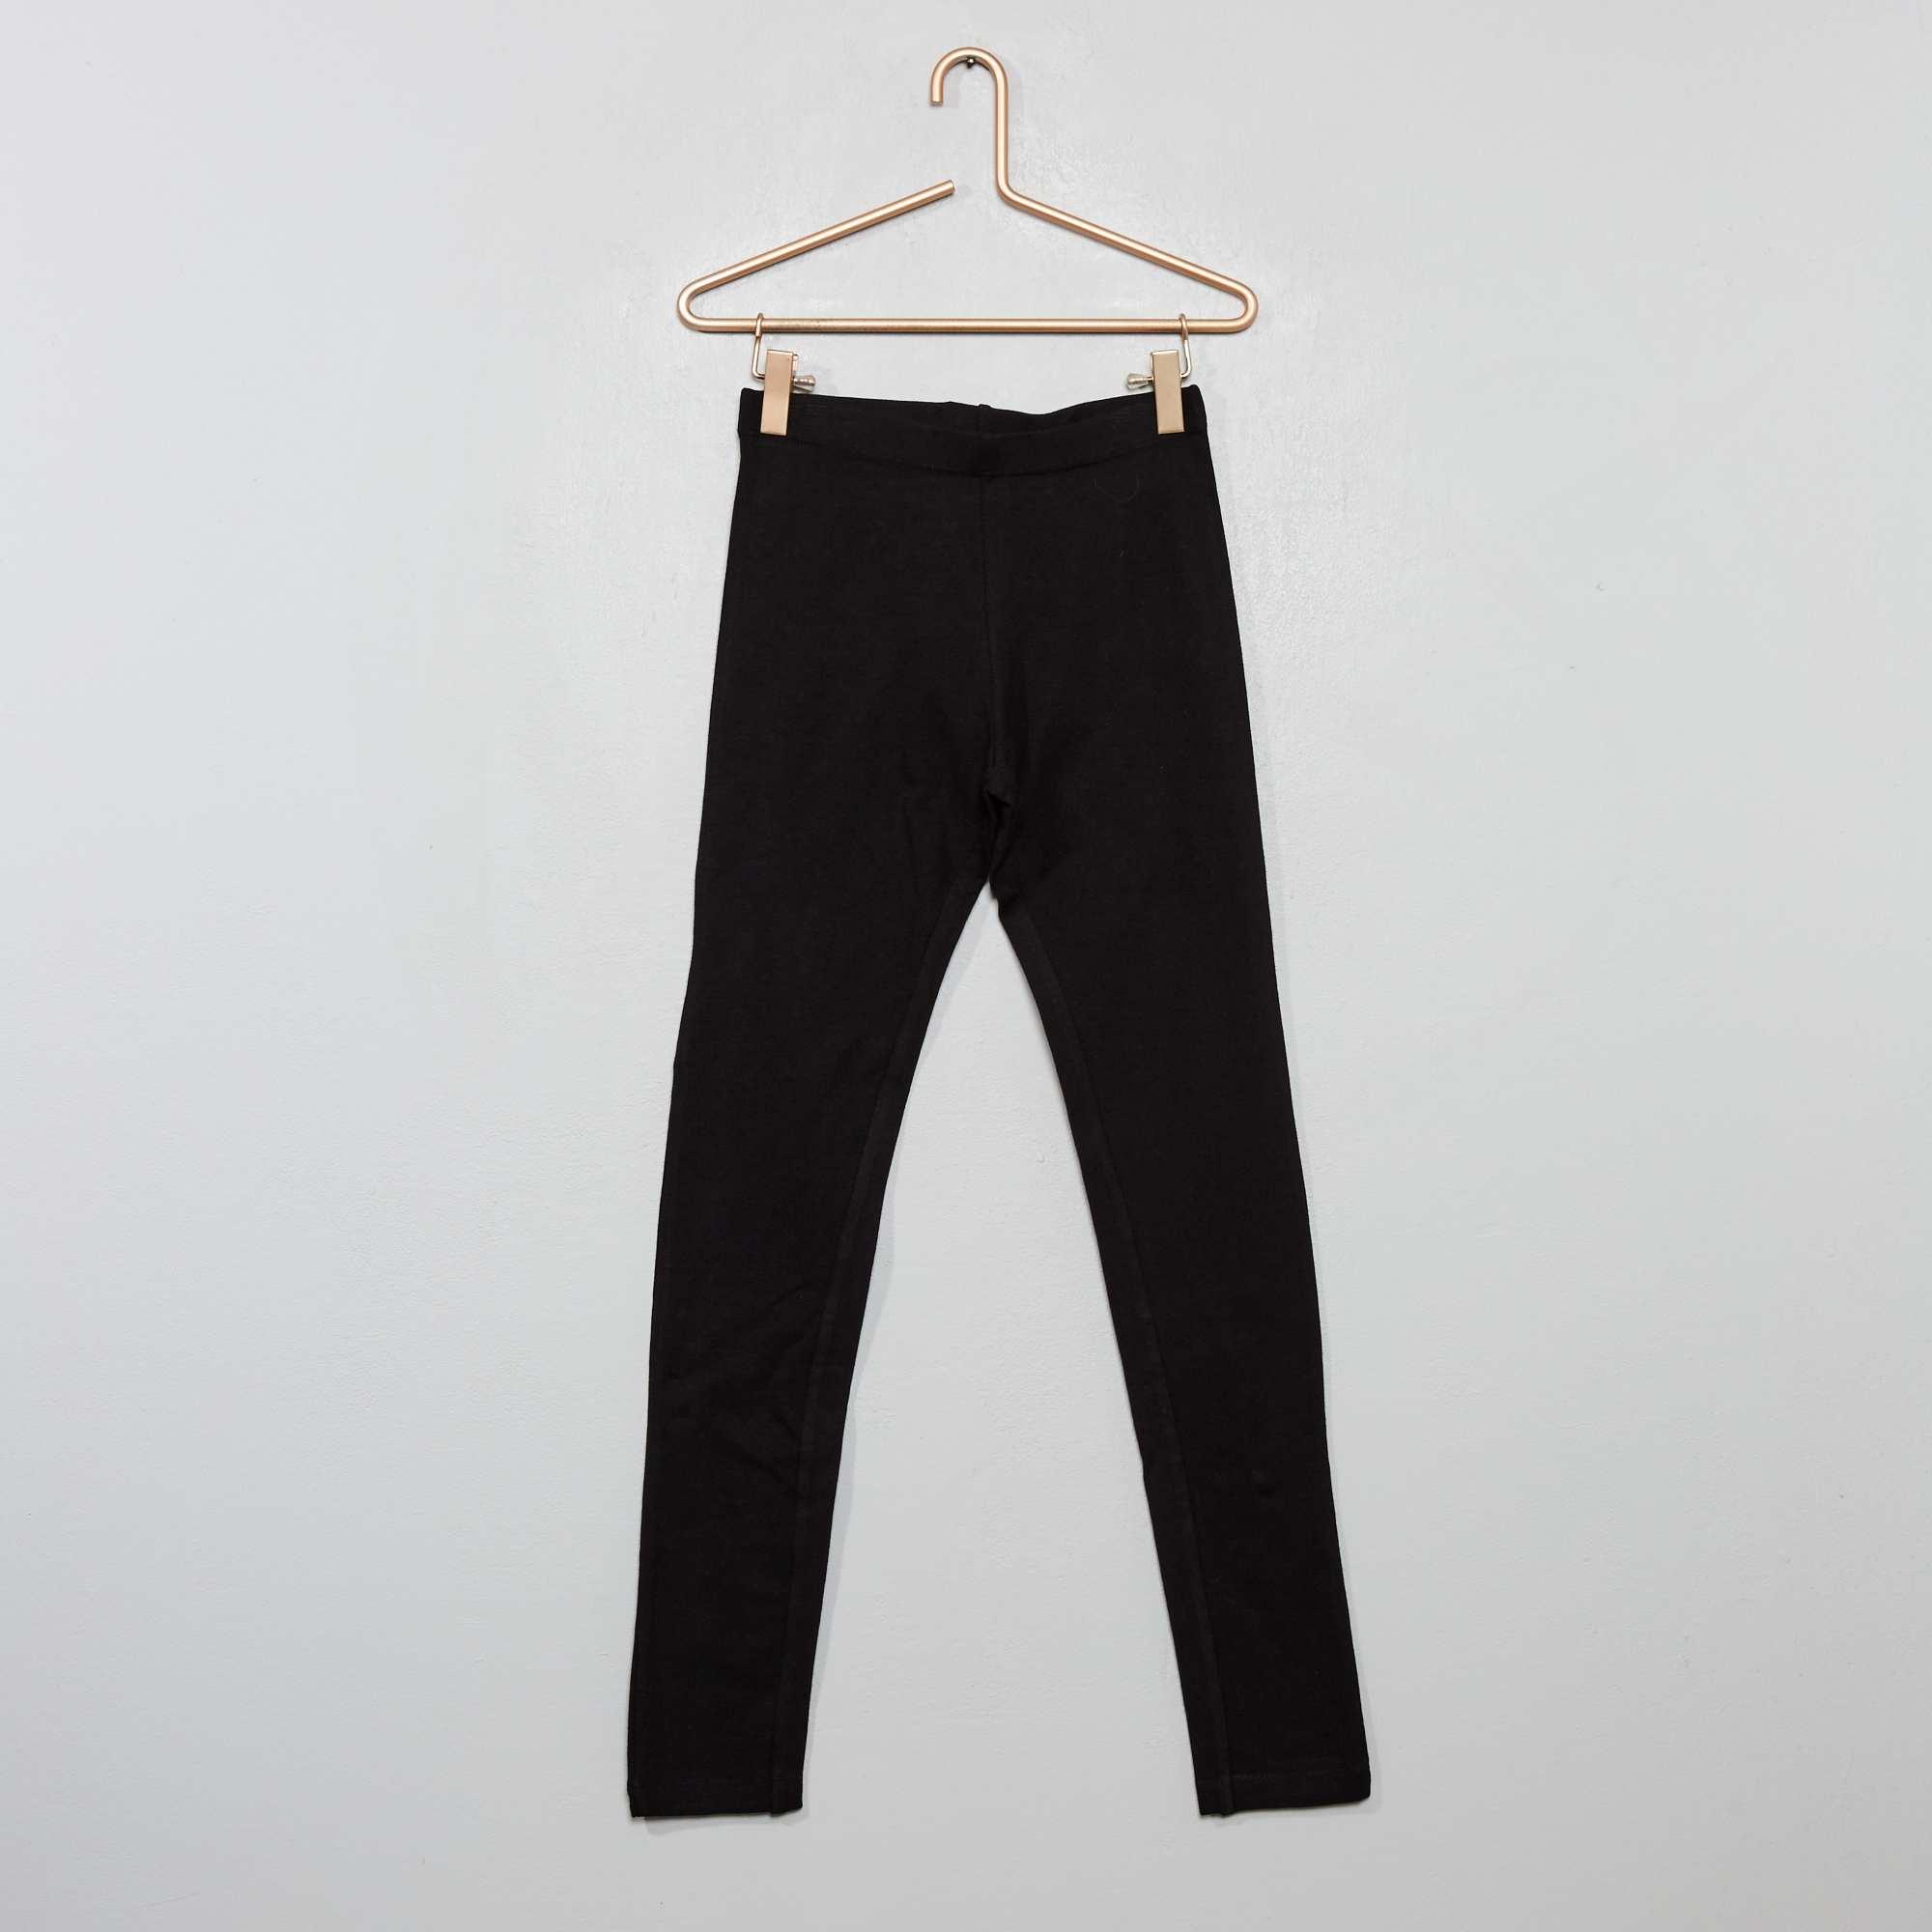 legging stretch uni fille adolescente kiabi 4 00. Black Bedroom Furniture Sets. Home Design Ideas